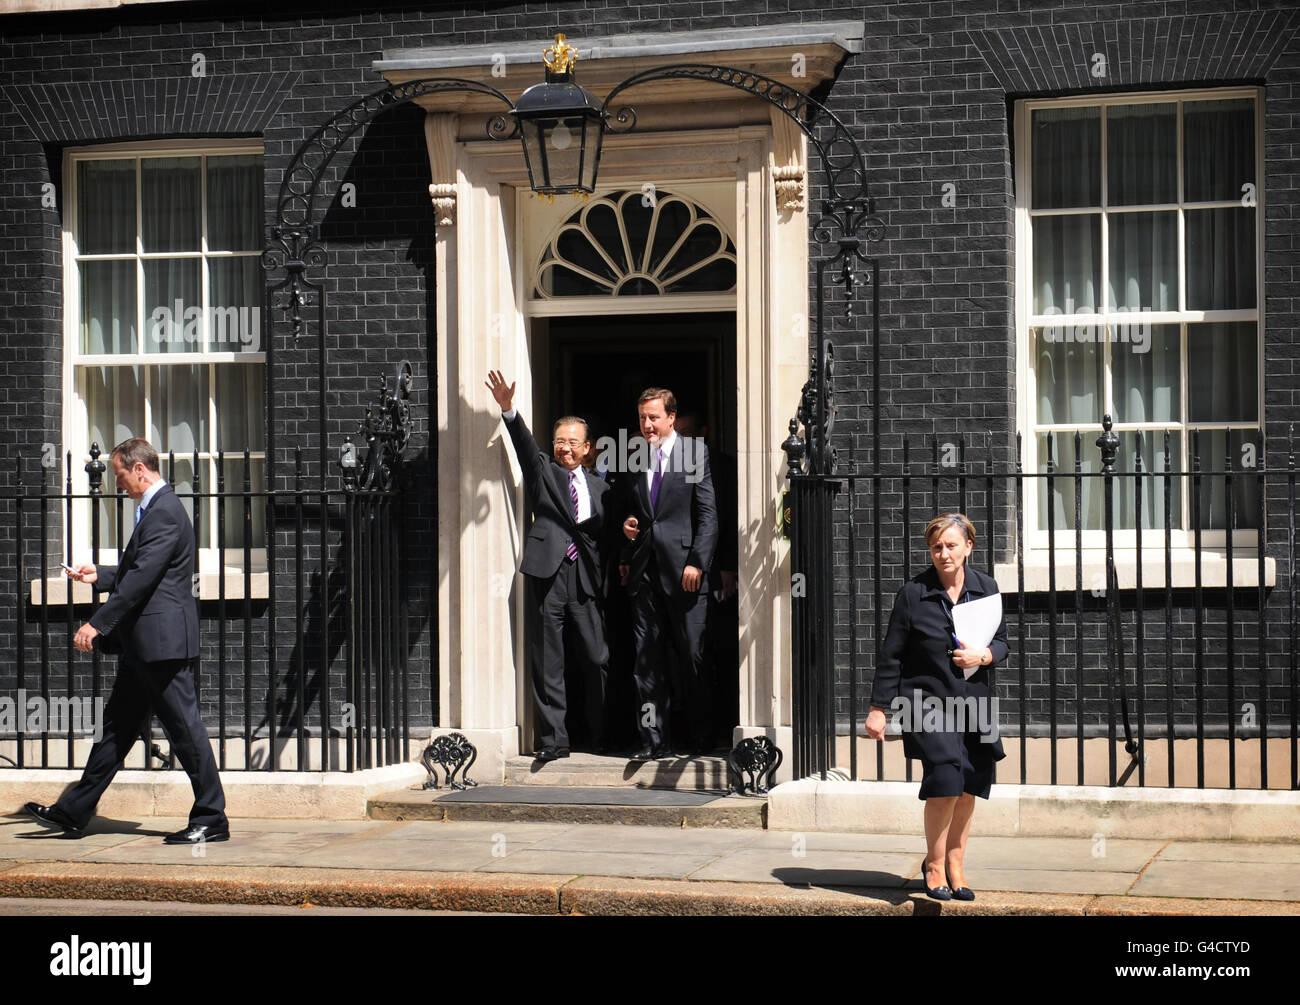 Chinese Premier Wen Jiabao visits UK - Stock Image